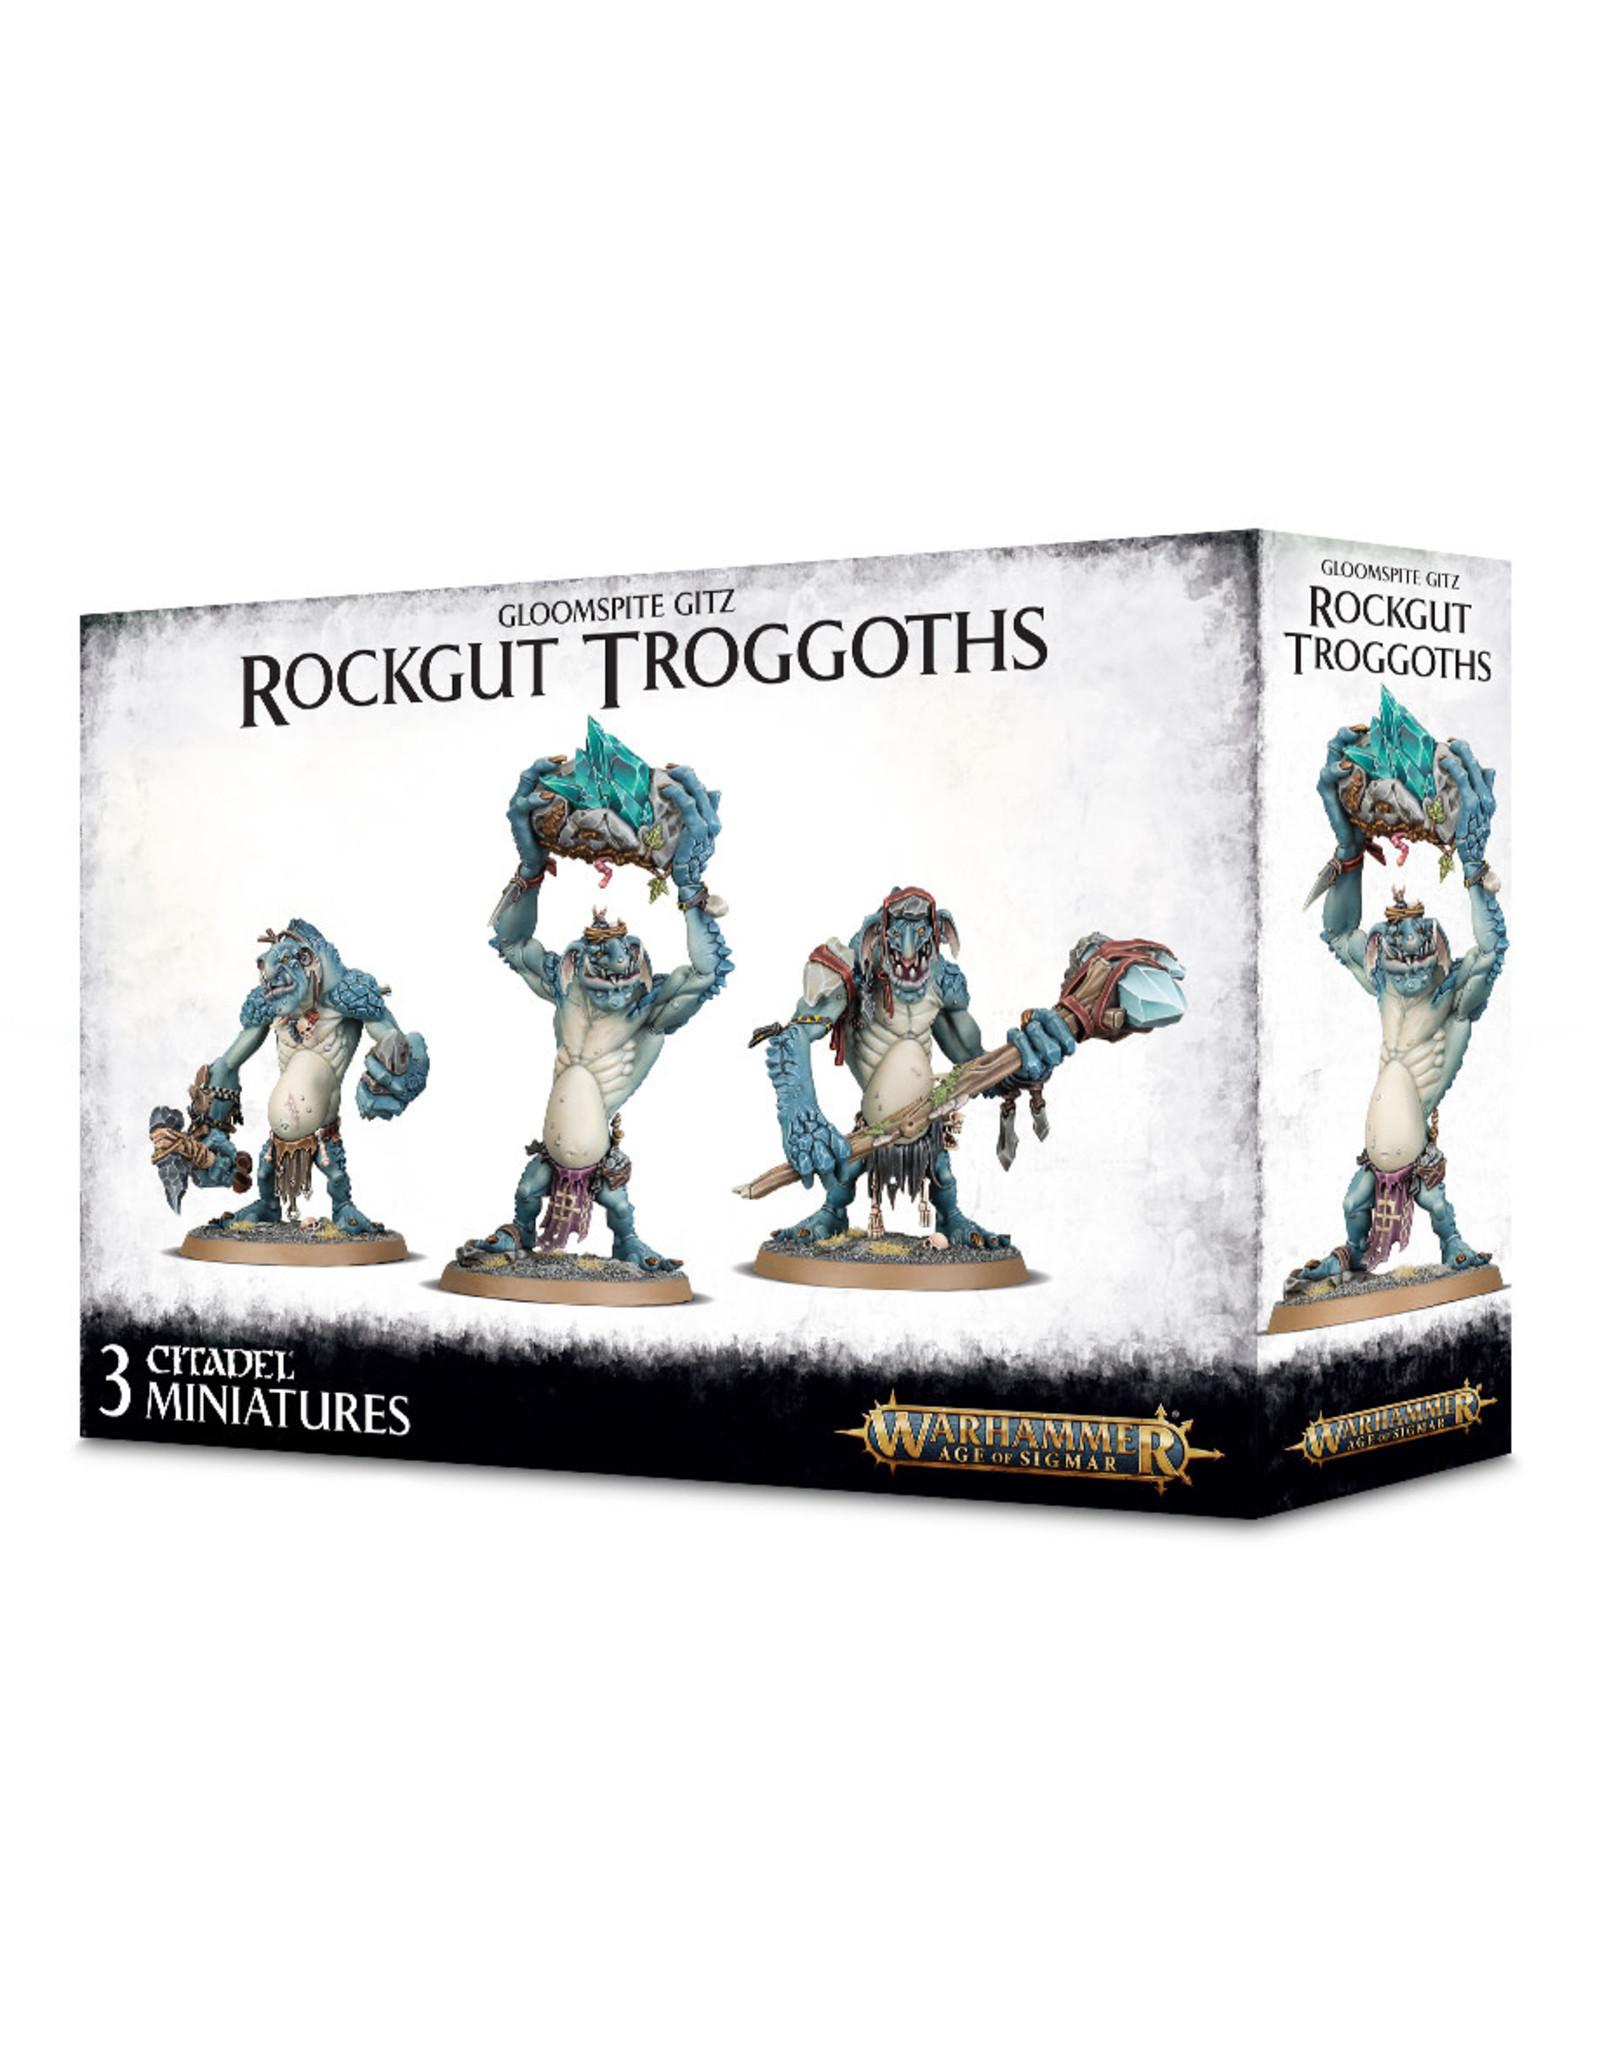 Games-Workshop GLOOMSPITE GITZ ROCKGUT TROGGOTHS